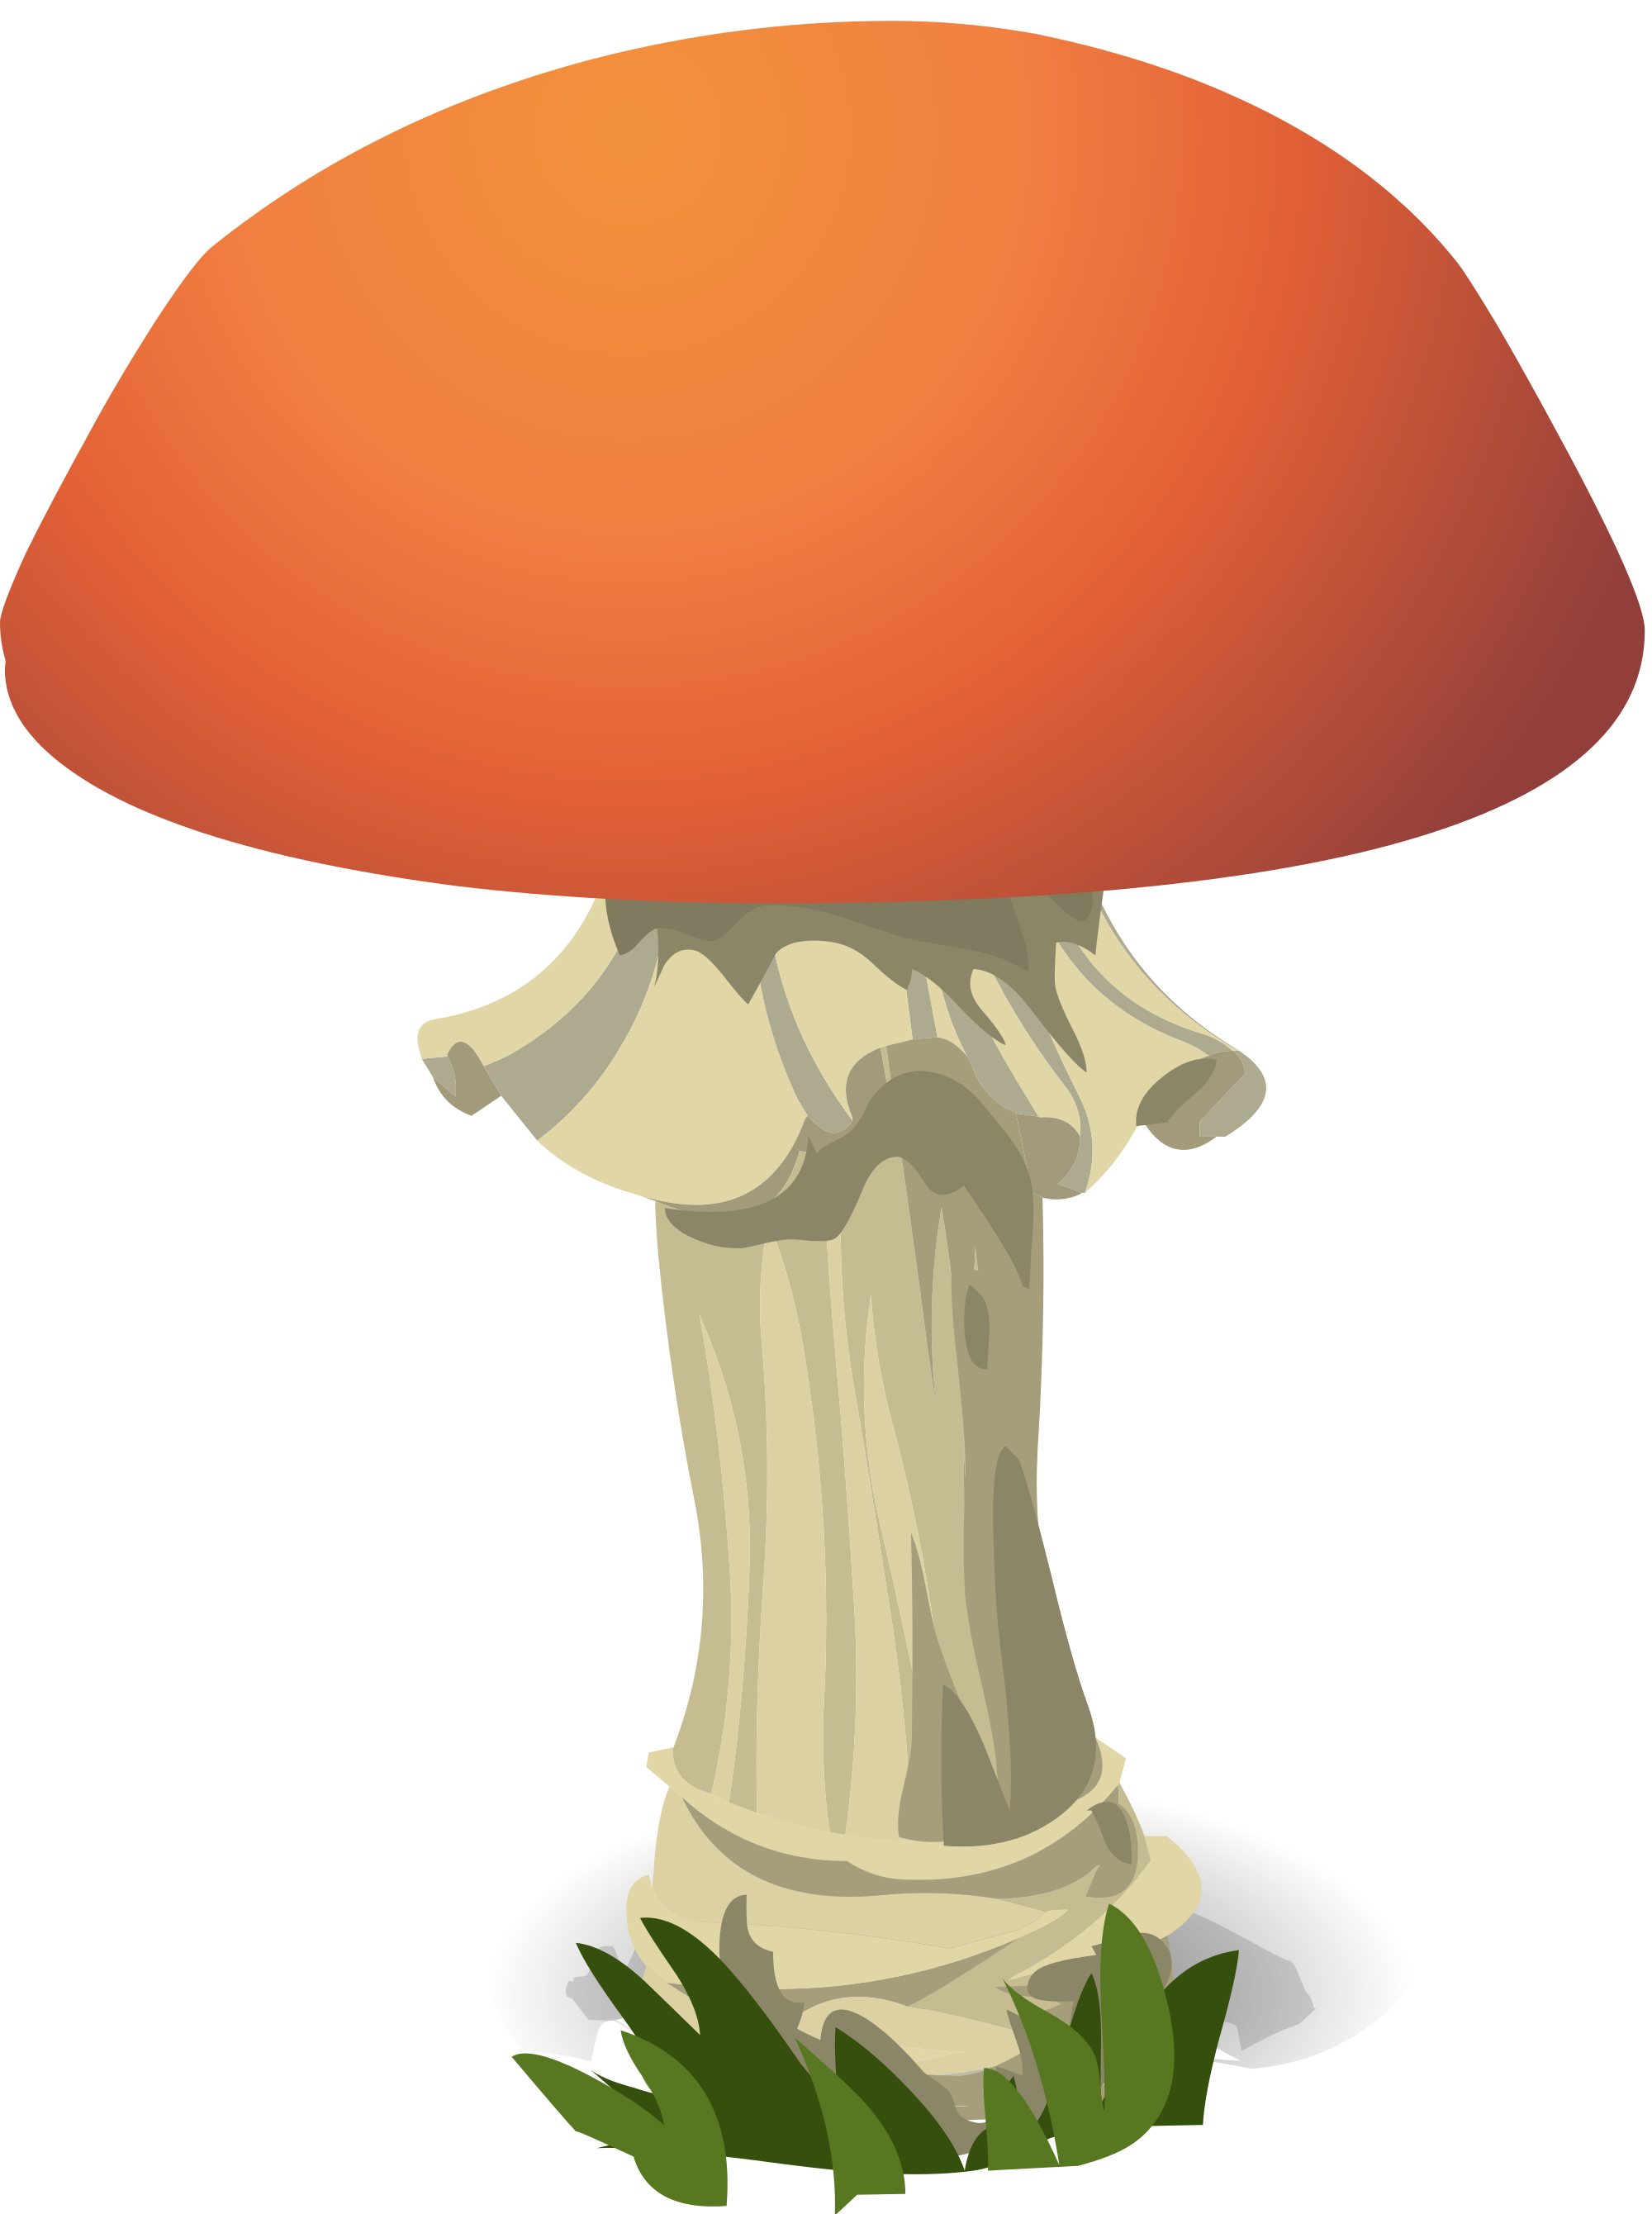 File svg wikimedia commons. Mushroom clipart edible mushroom